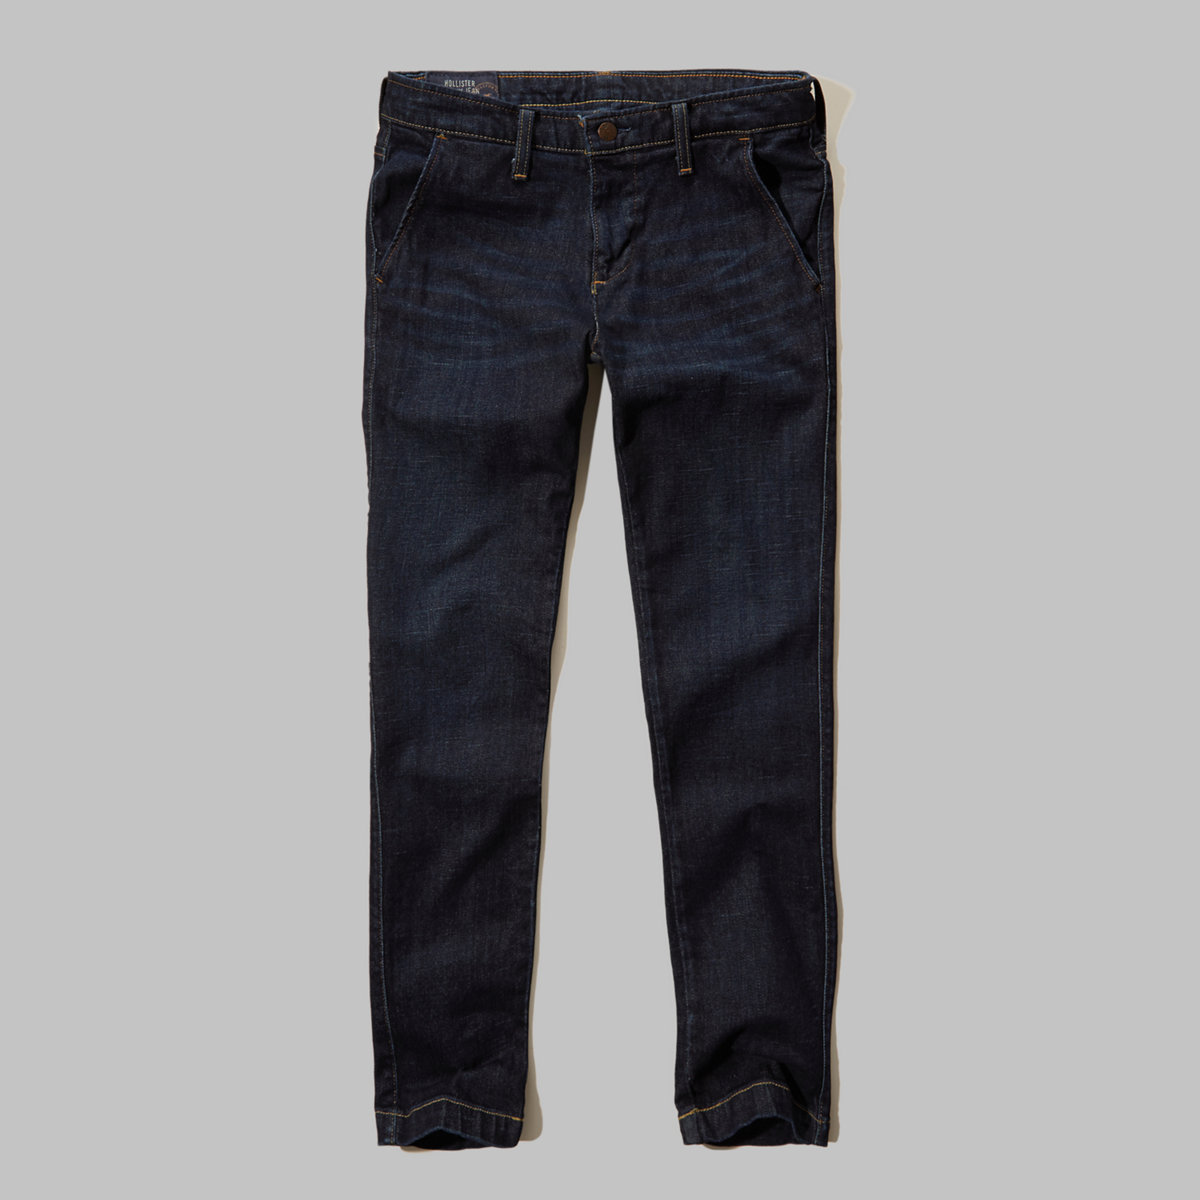 Hollister Skinny Trouser Jeans